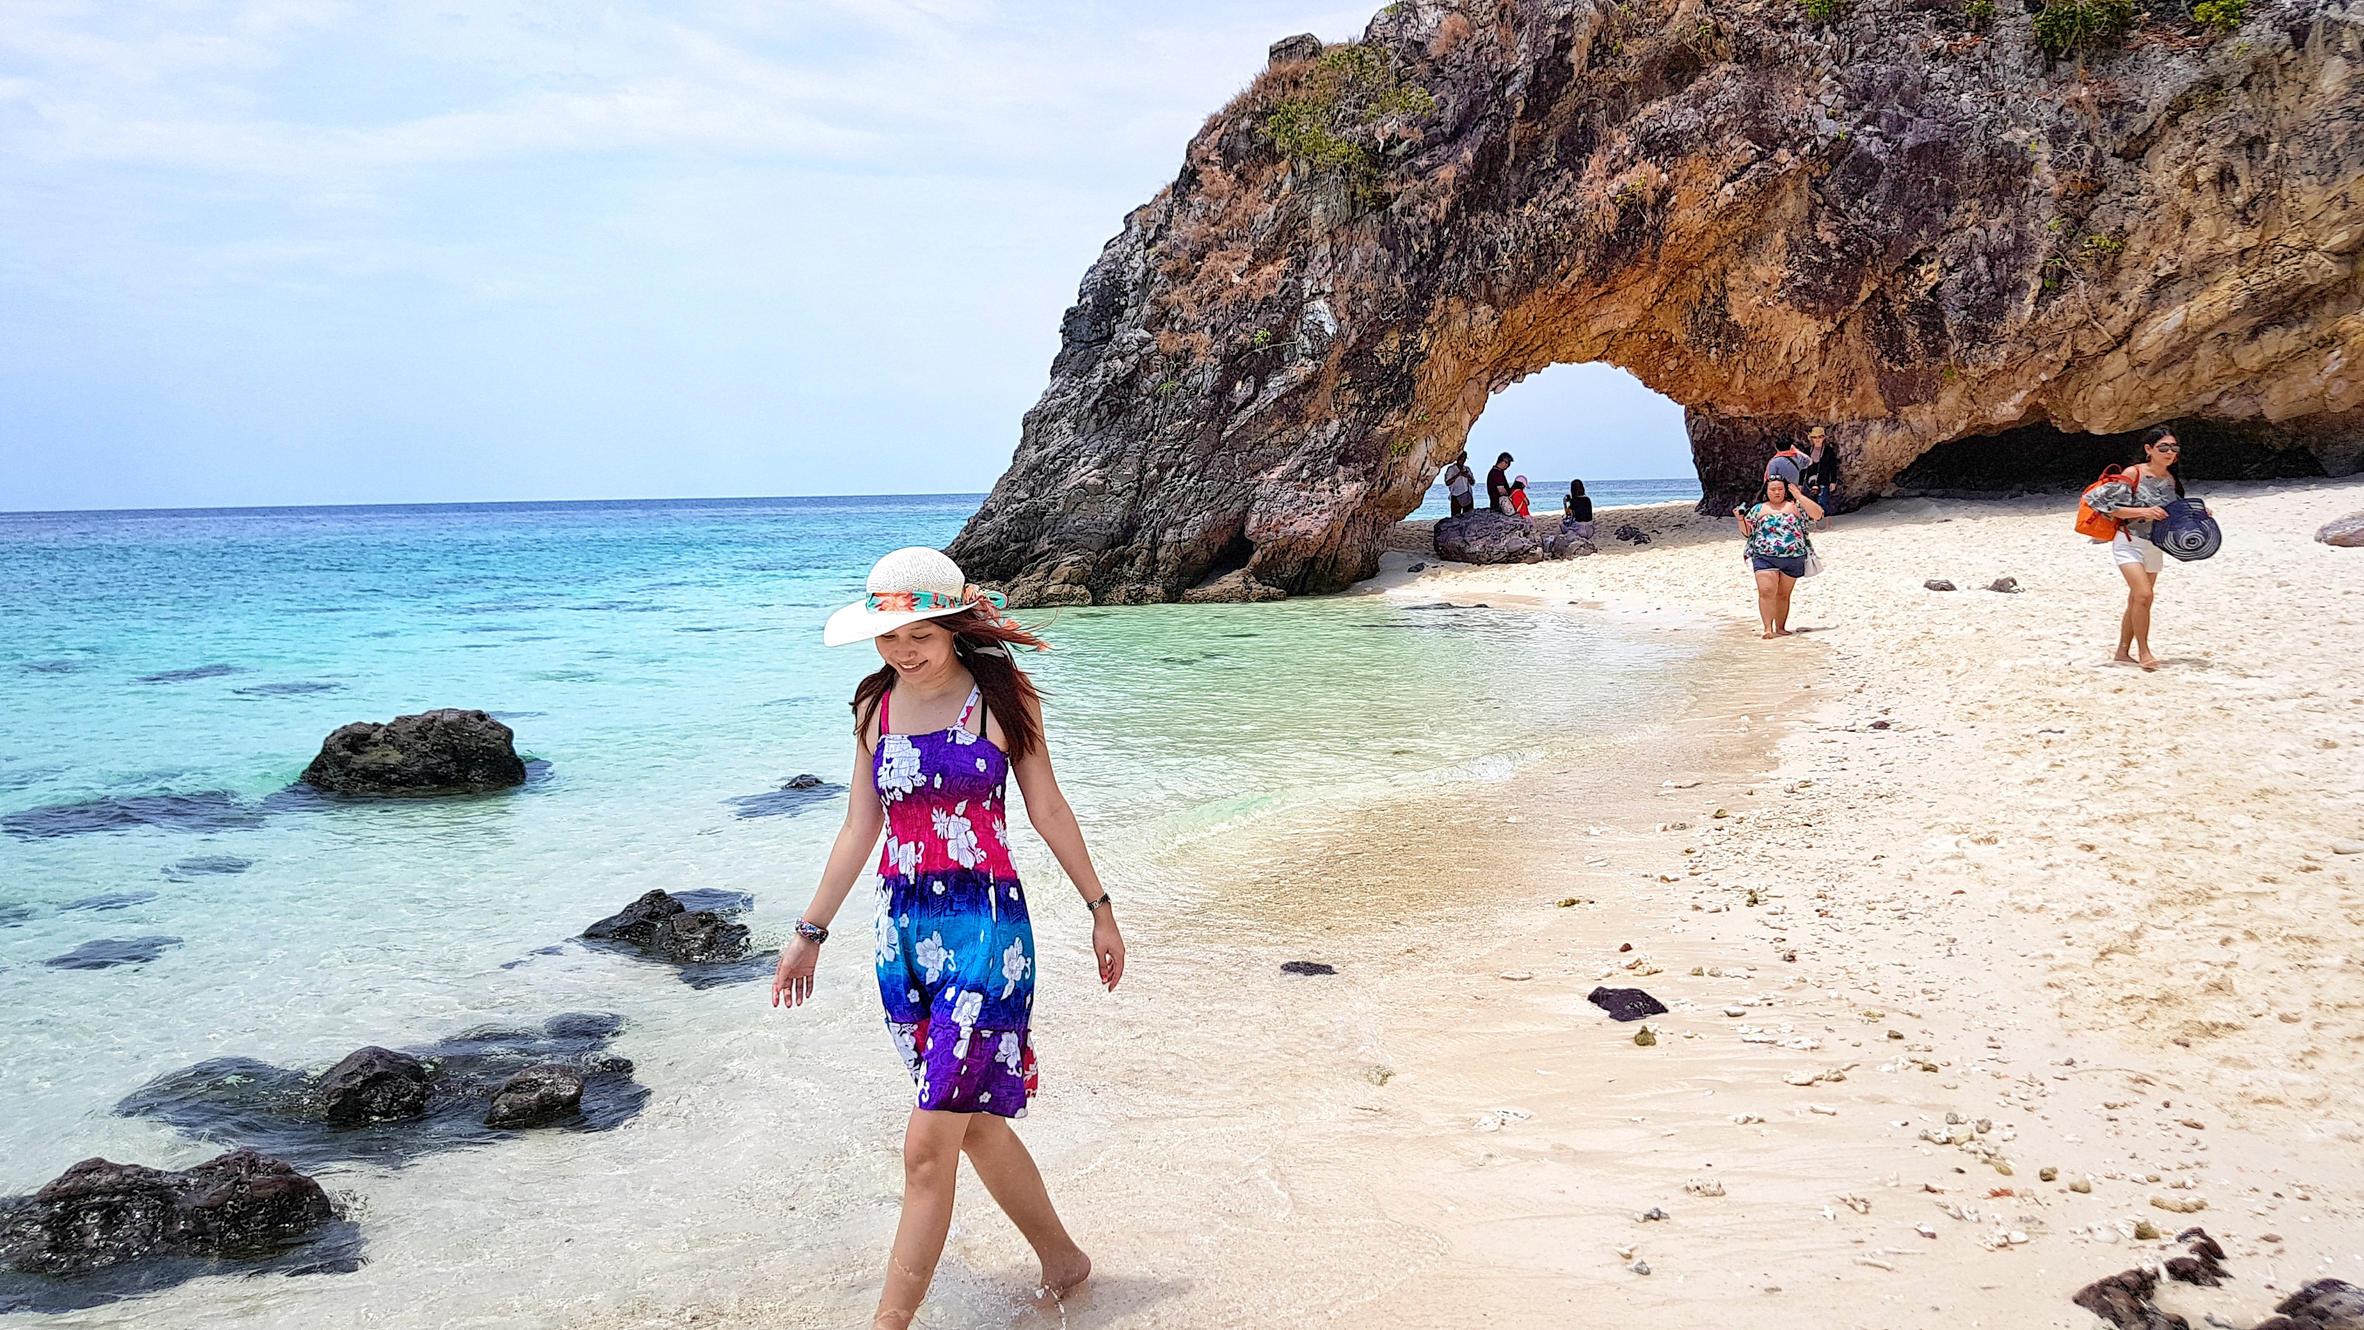 @shiki_shiki_shiki's cover photo for 'ALL POSTS | Shiki Adventures | Travel Inspirations, Deals and more.'